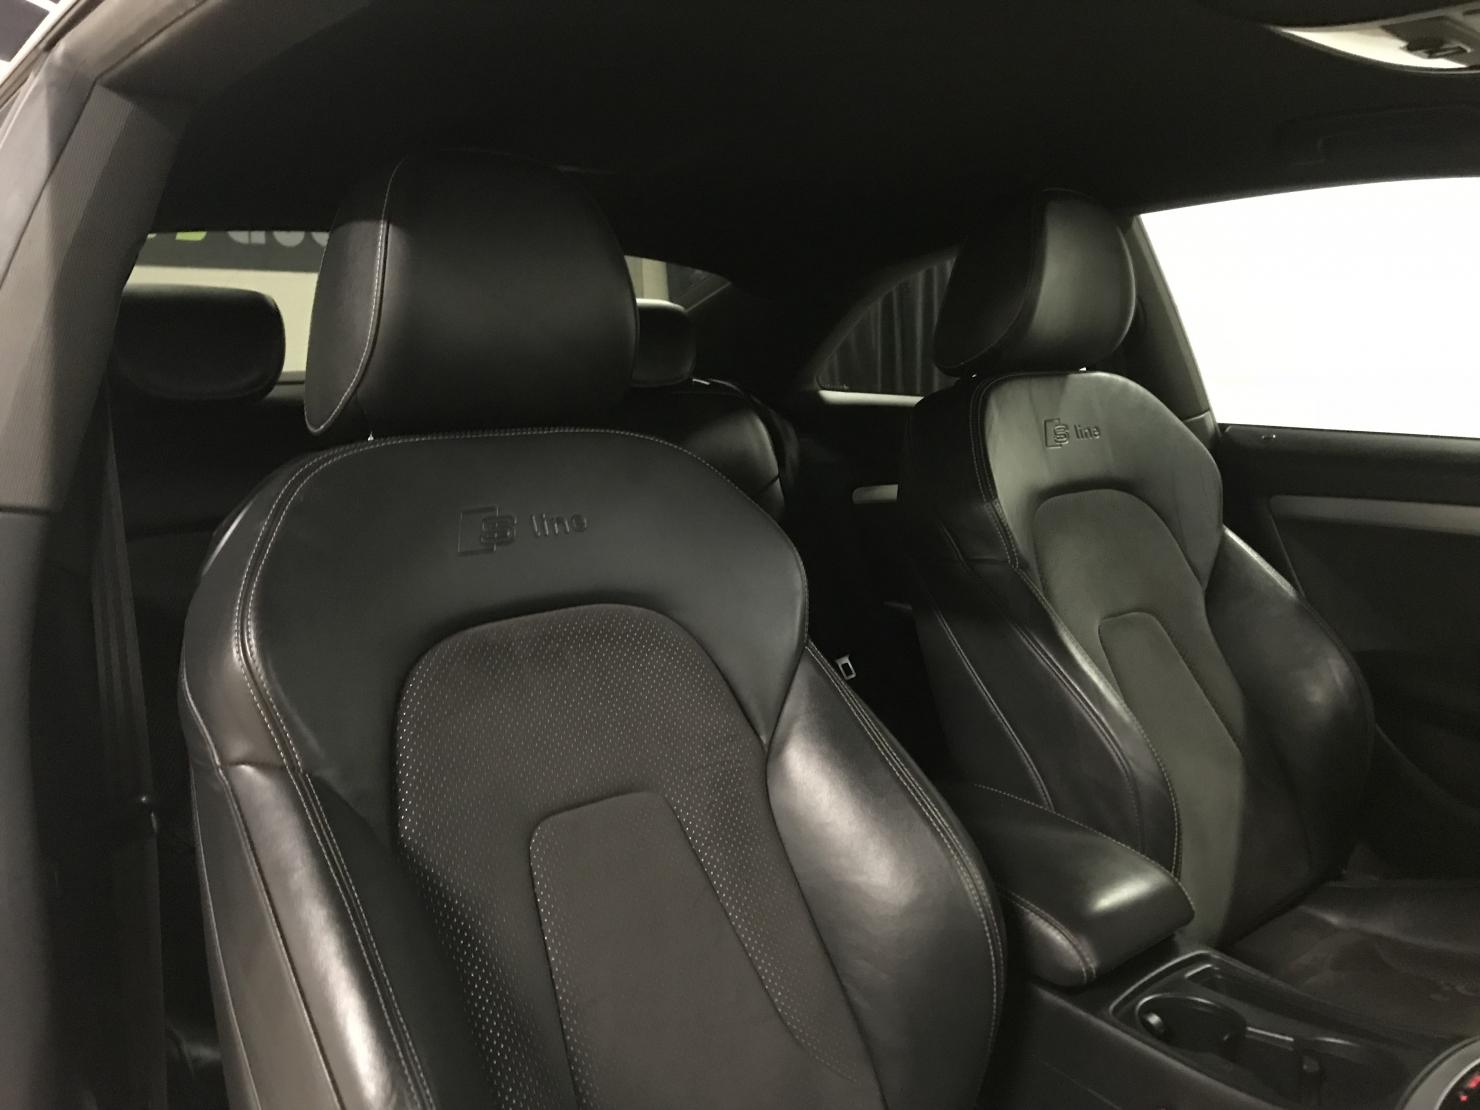 Audi A5 Coupé 2.0 TFSI 211 cv S-Line +